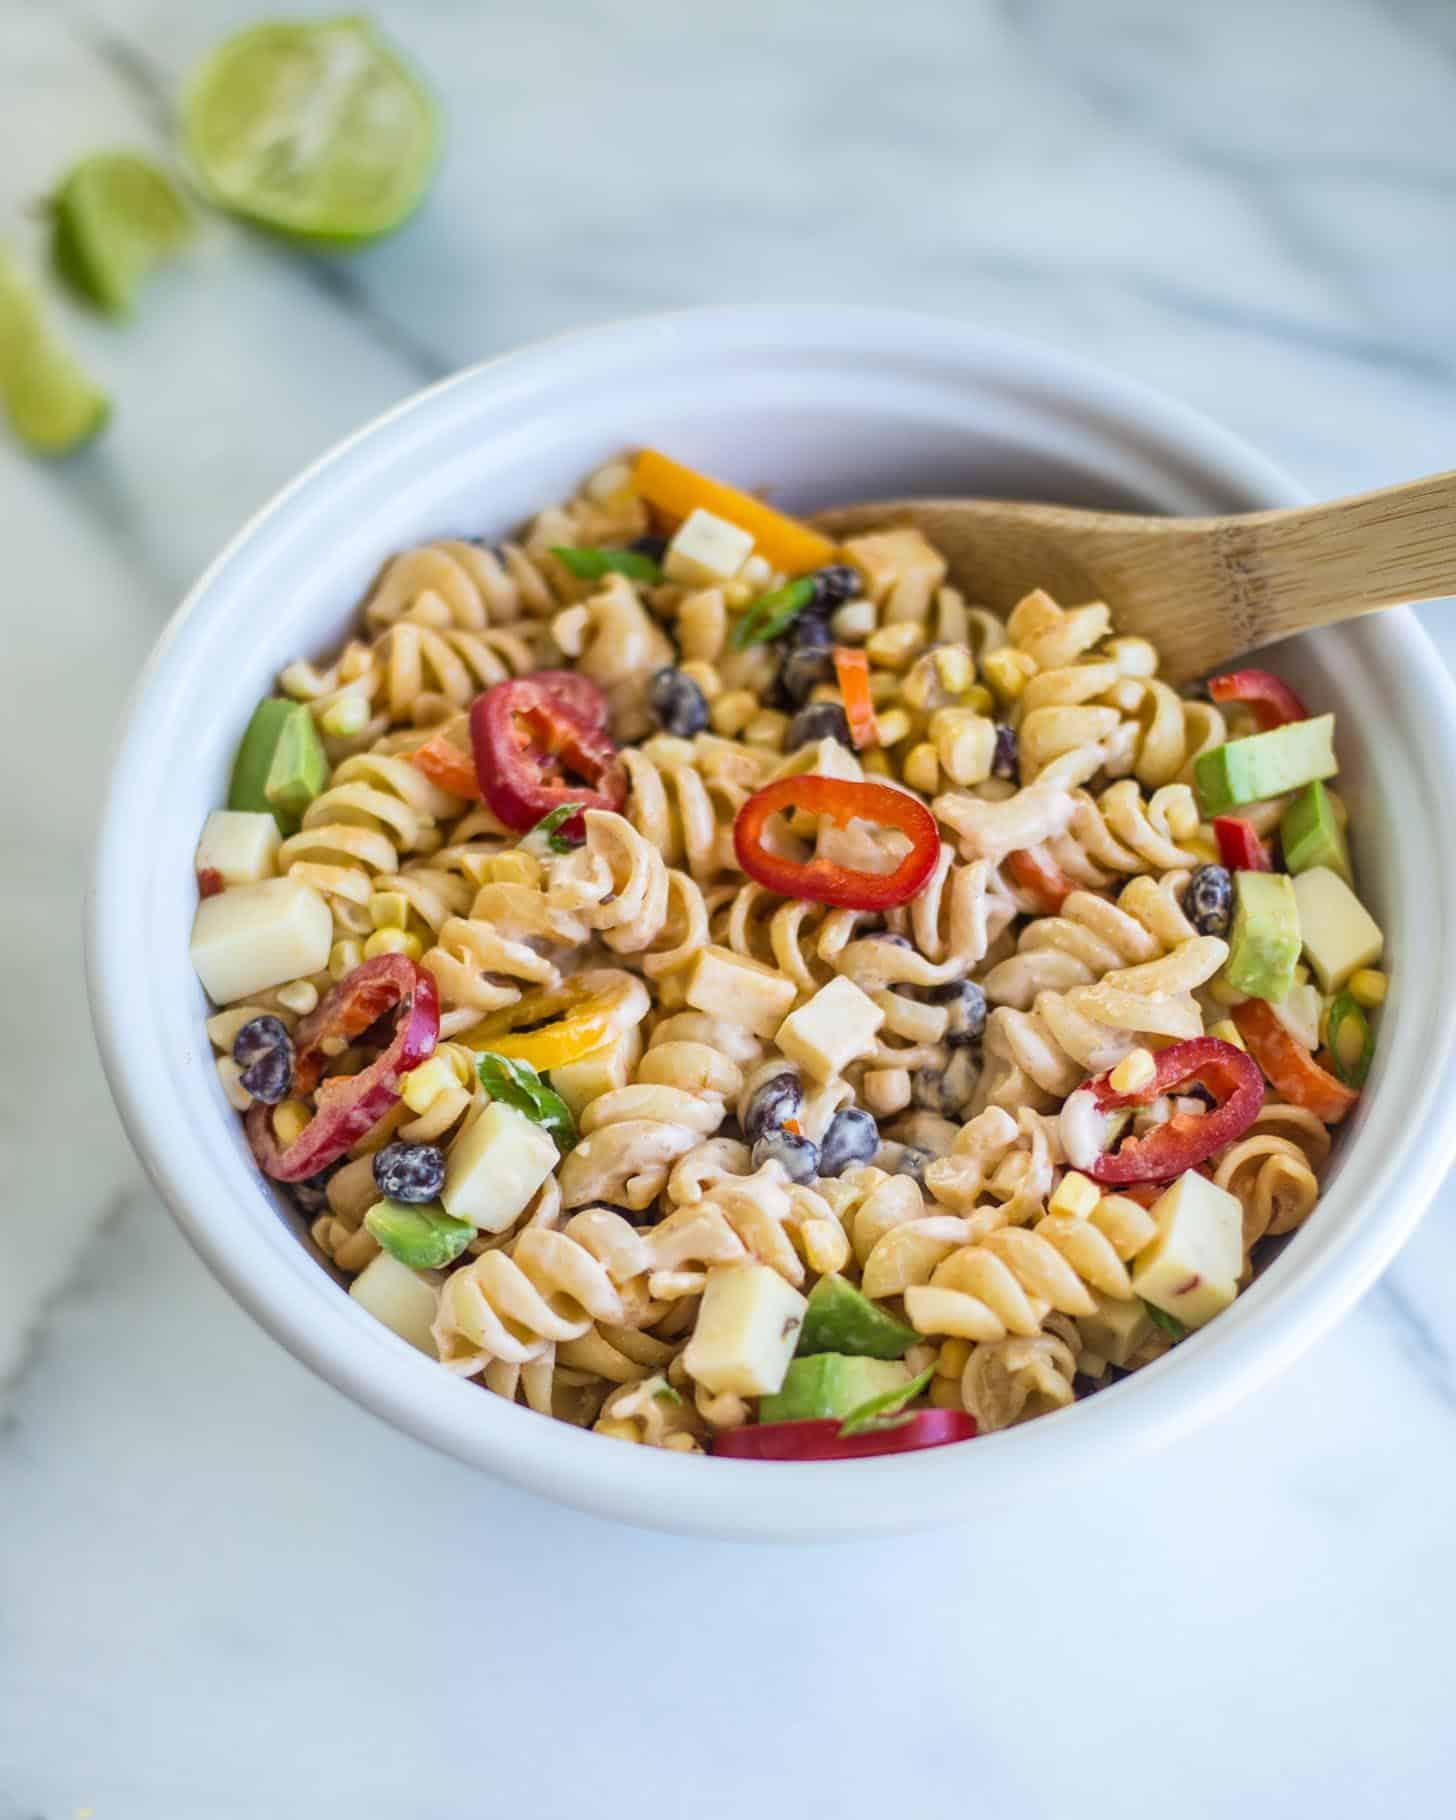 stirring pasta salad in a white bowl